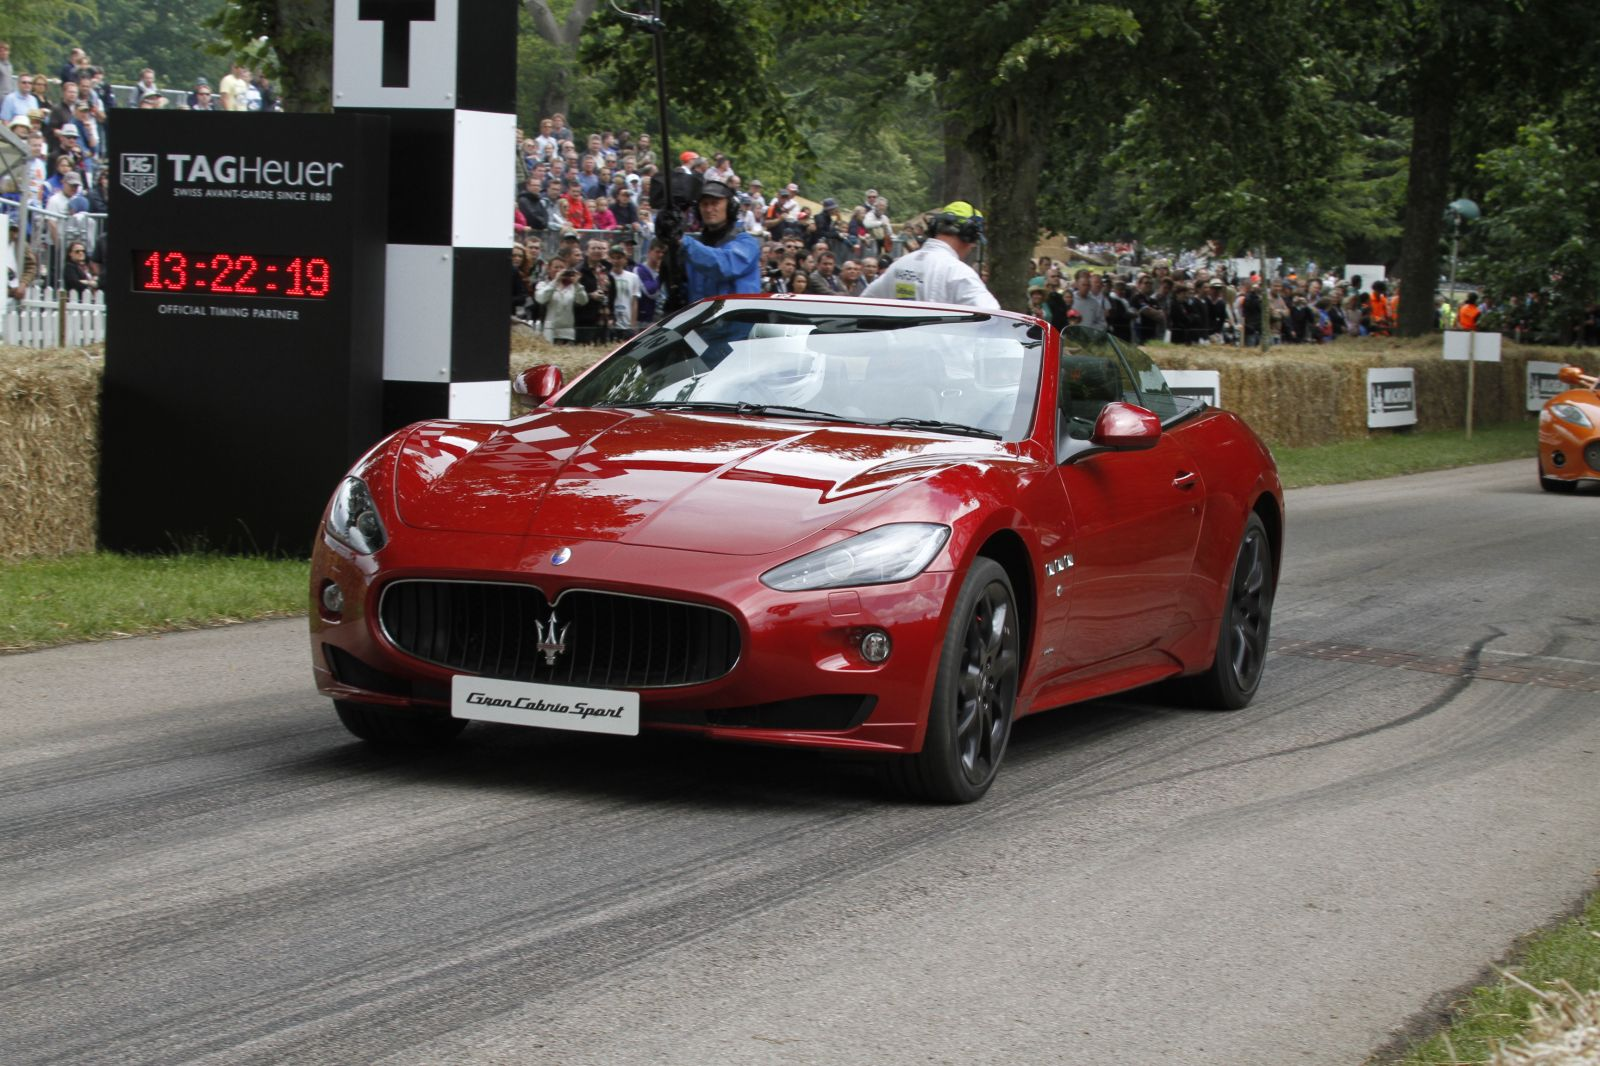 Maserati GranTurismo Sport Debut In 2012 Goodwood Festival Of Speed